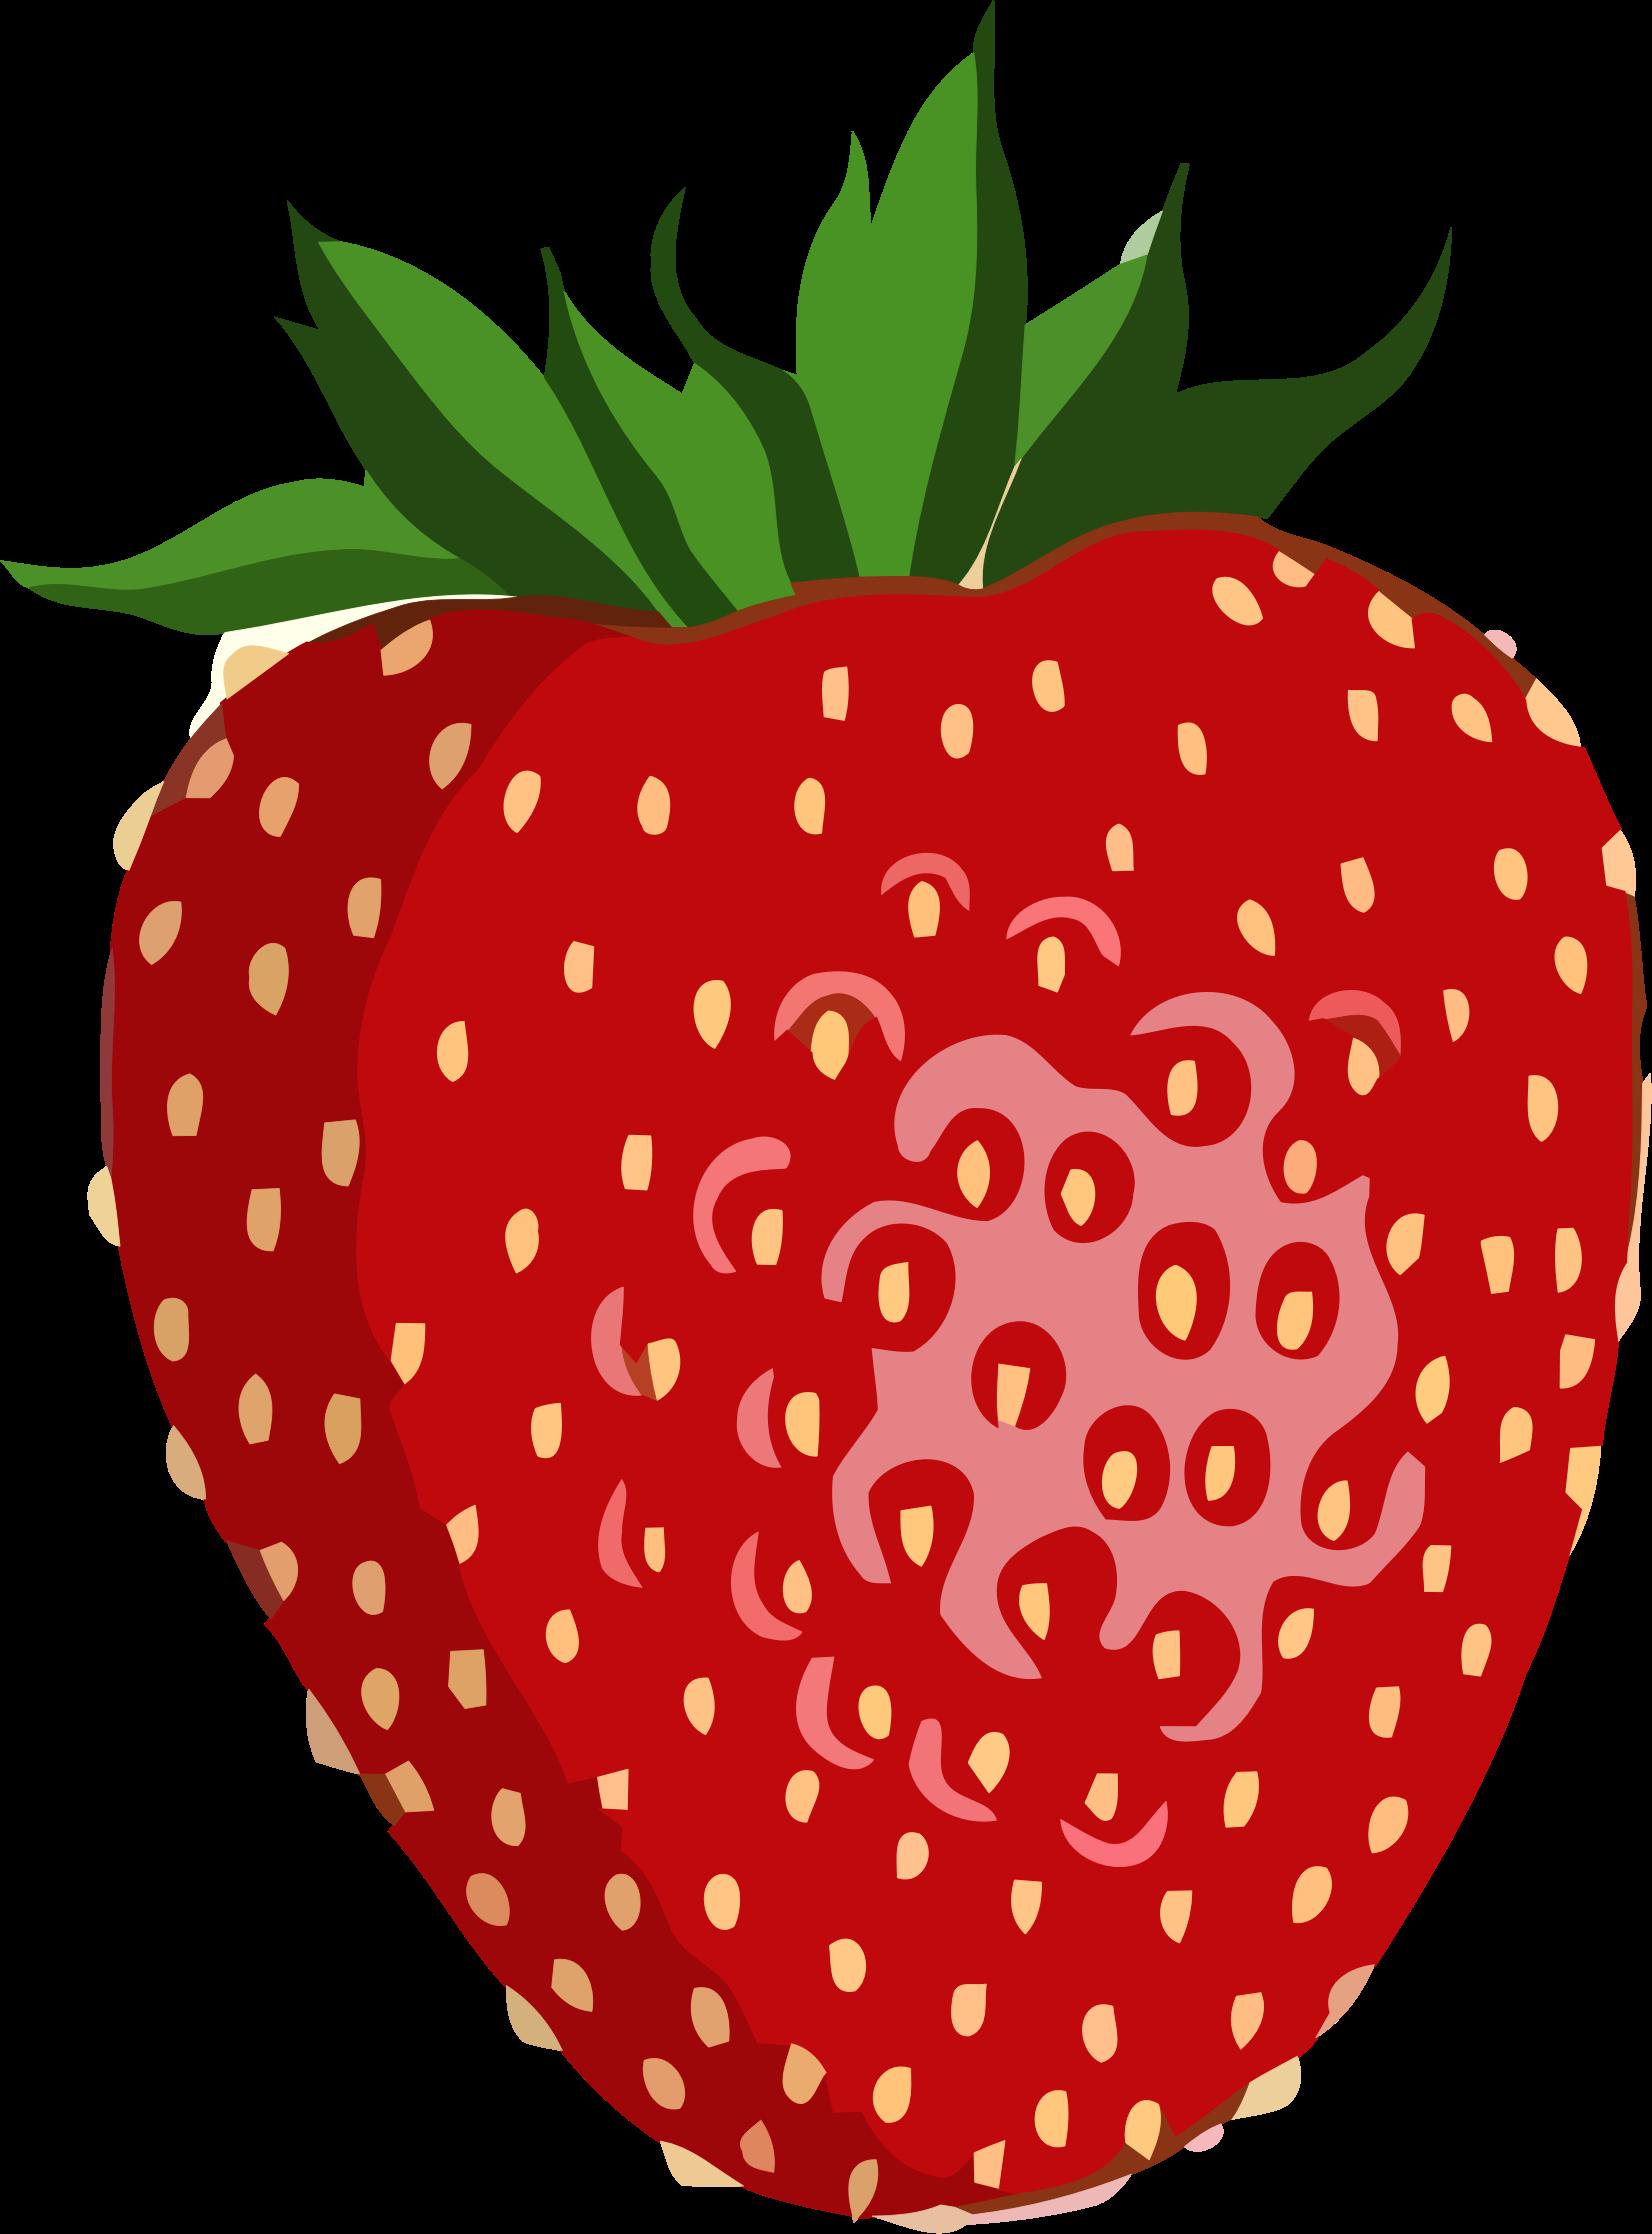 1652x2234 Shiny Strawberry Vector Graphic Image